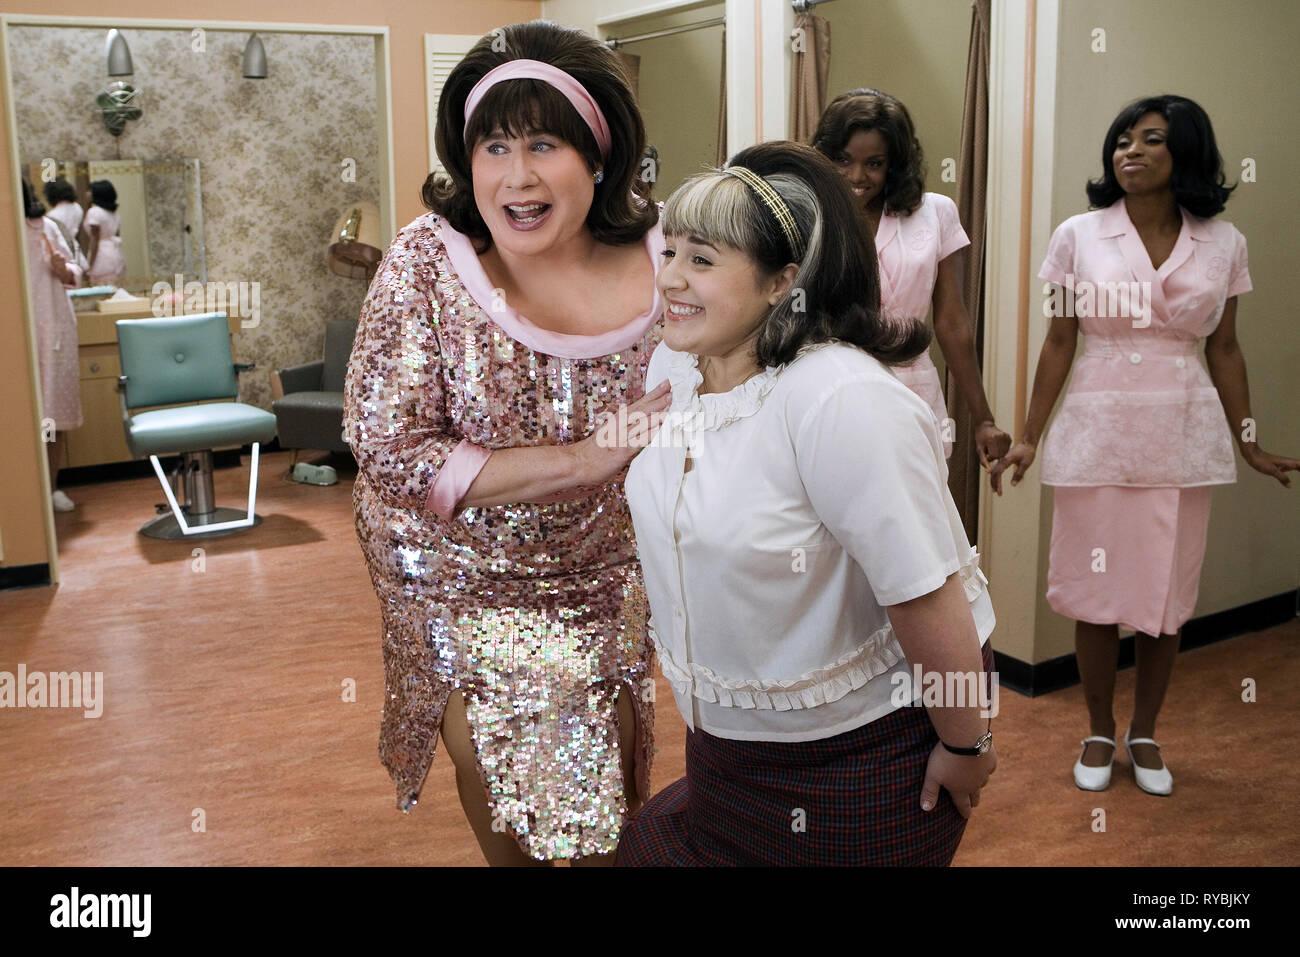 John Travolta Hairspray High Resolution Stock Photography And Images Alamy